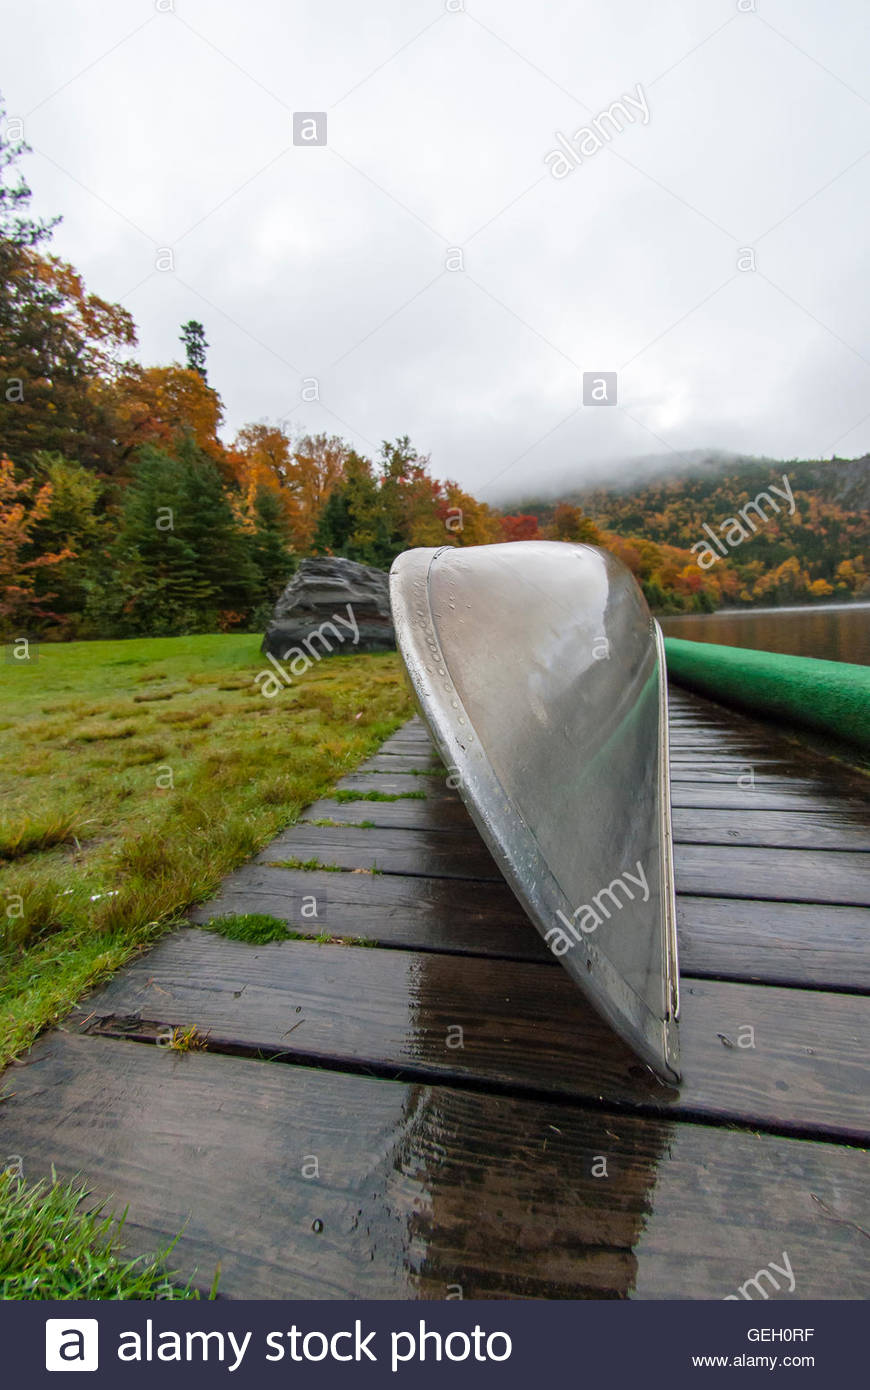 Bow of aluminum canoe on rainy day in New Hampshire - Stock Image